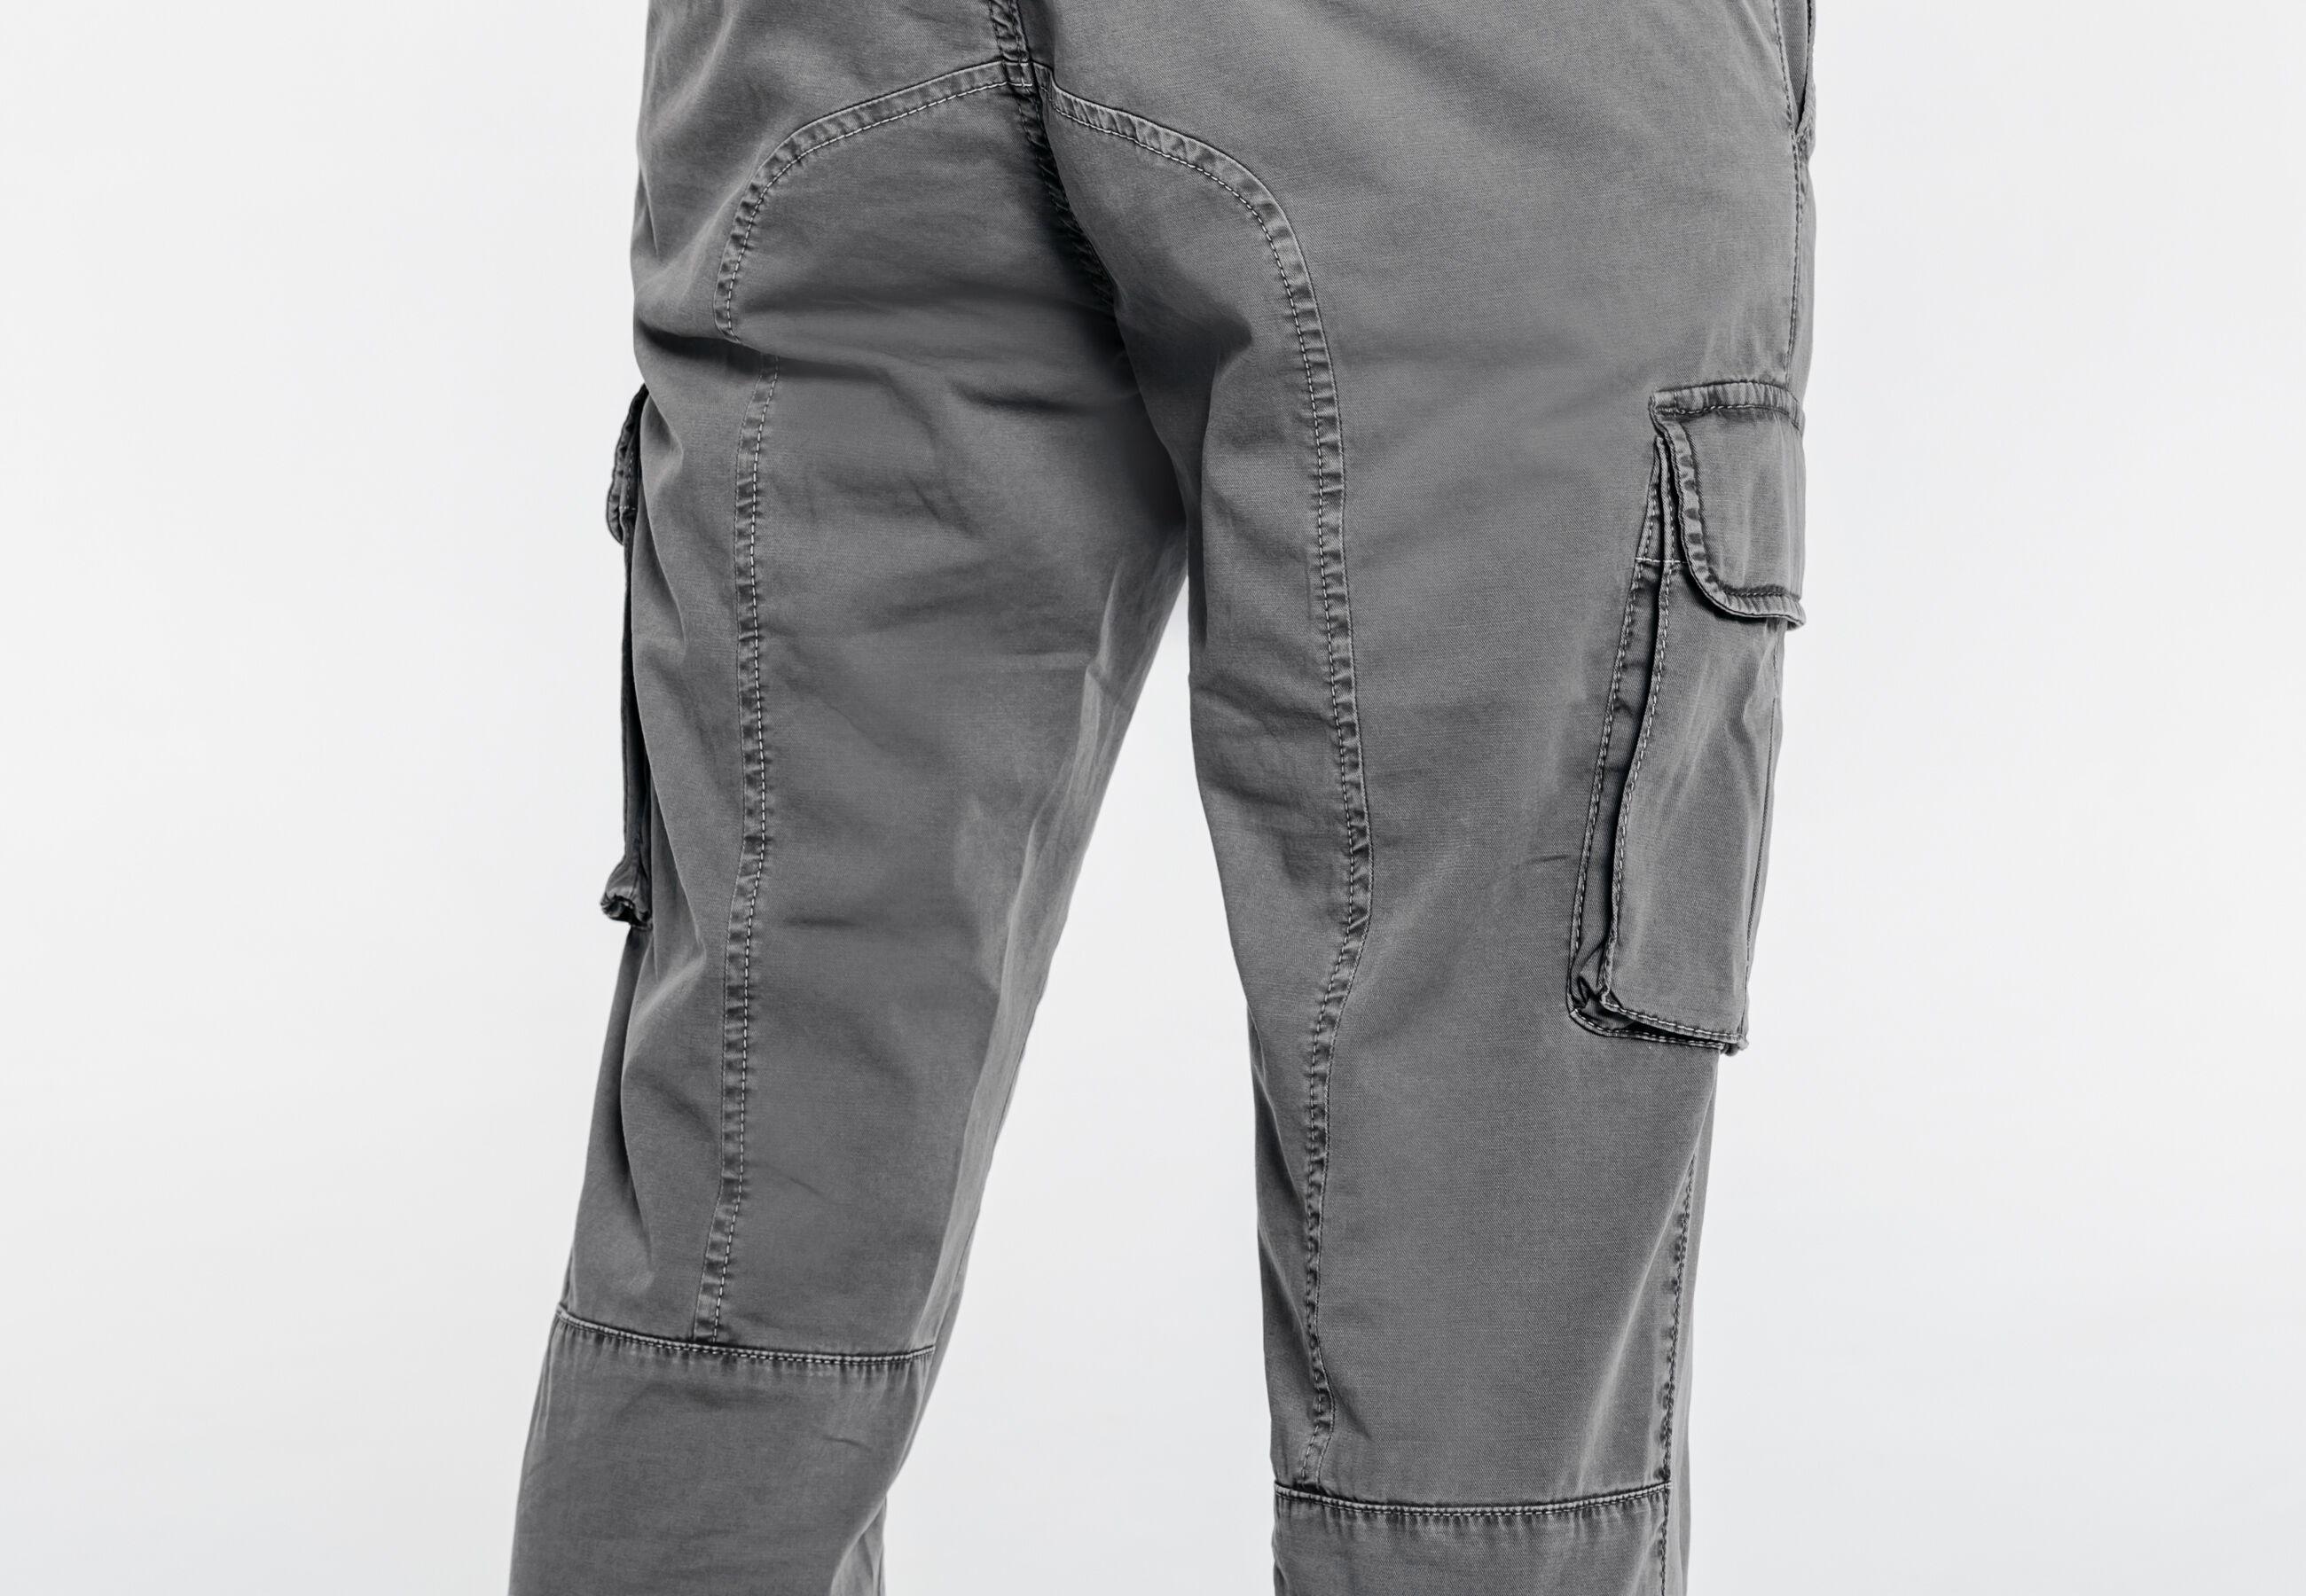 pantalon battle slim coton stretch gris homme jules. Black Bedroom Furniture Sets. Home Design Ideas